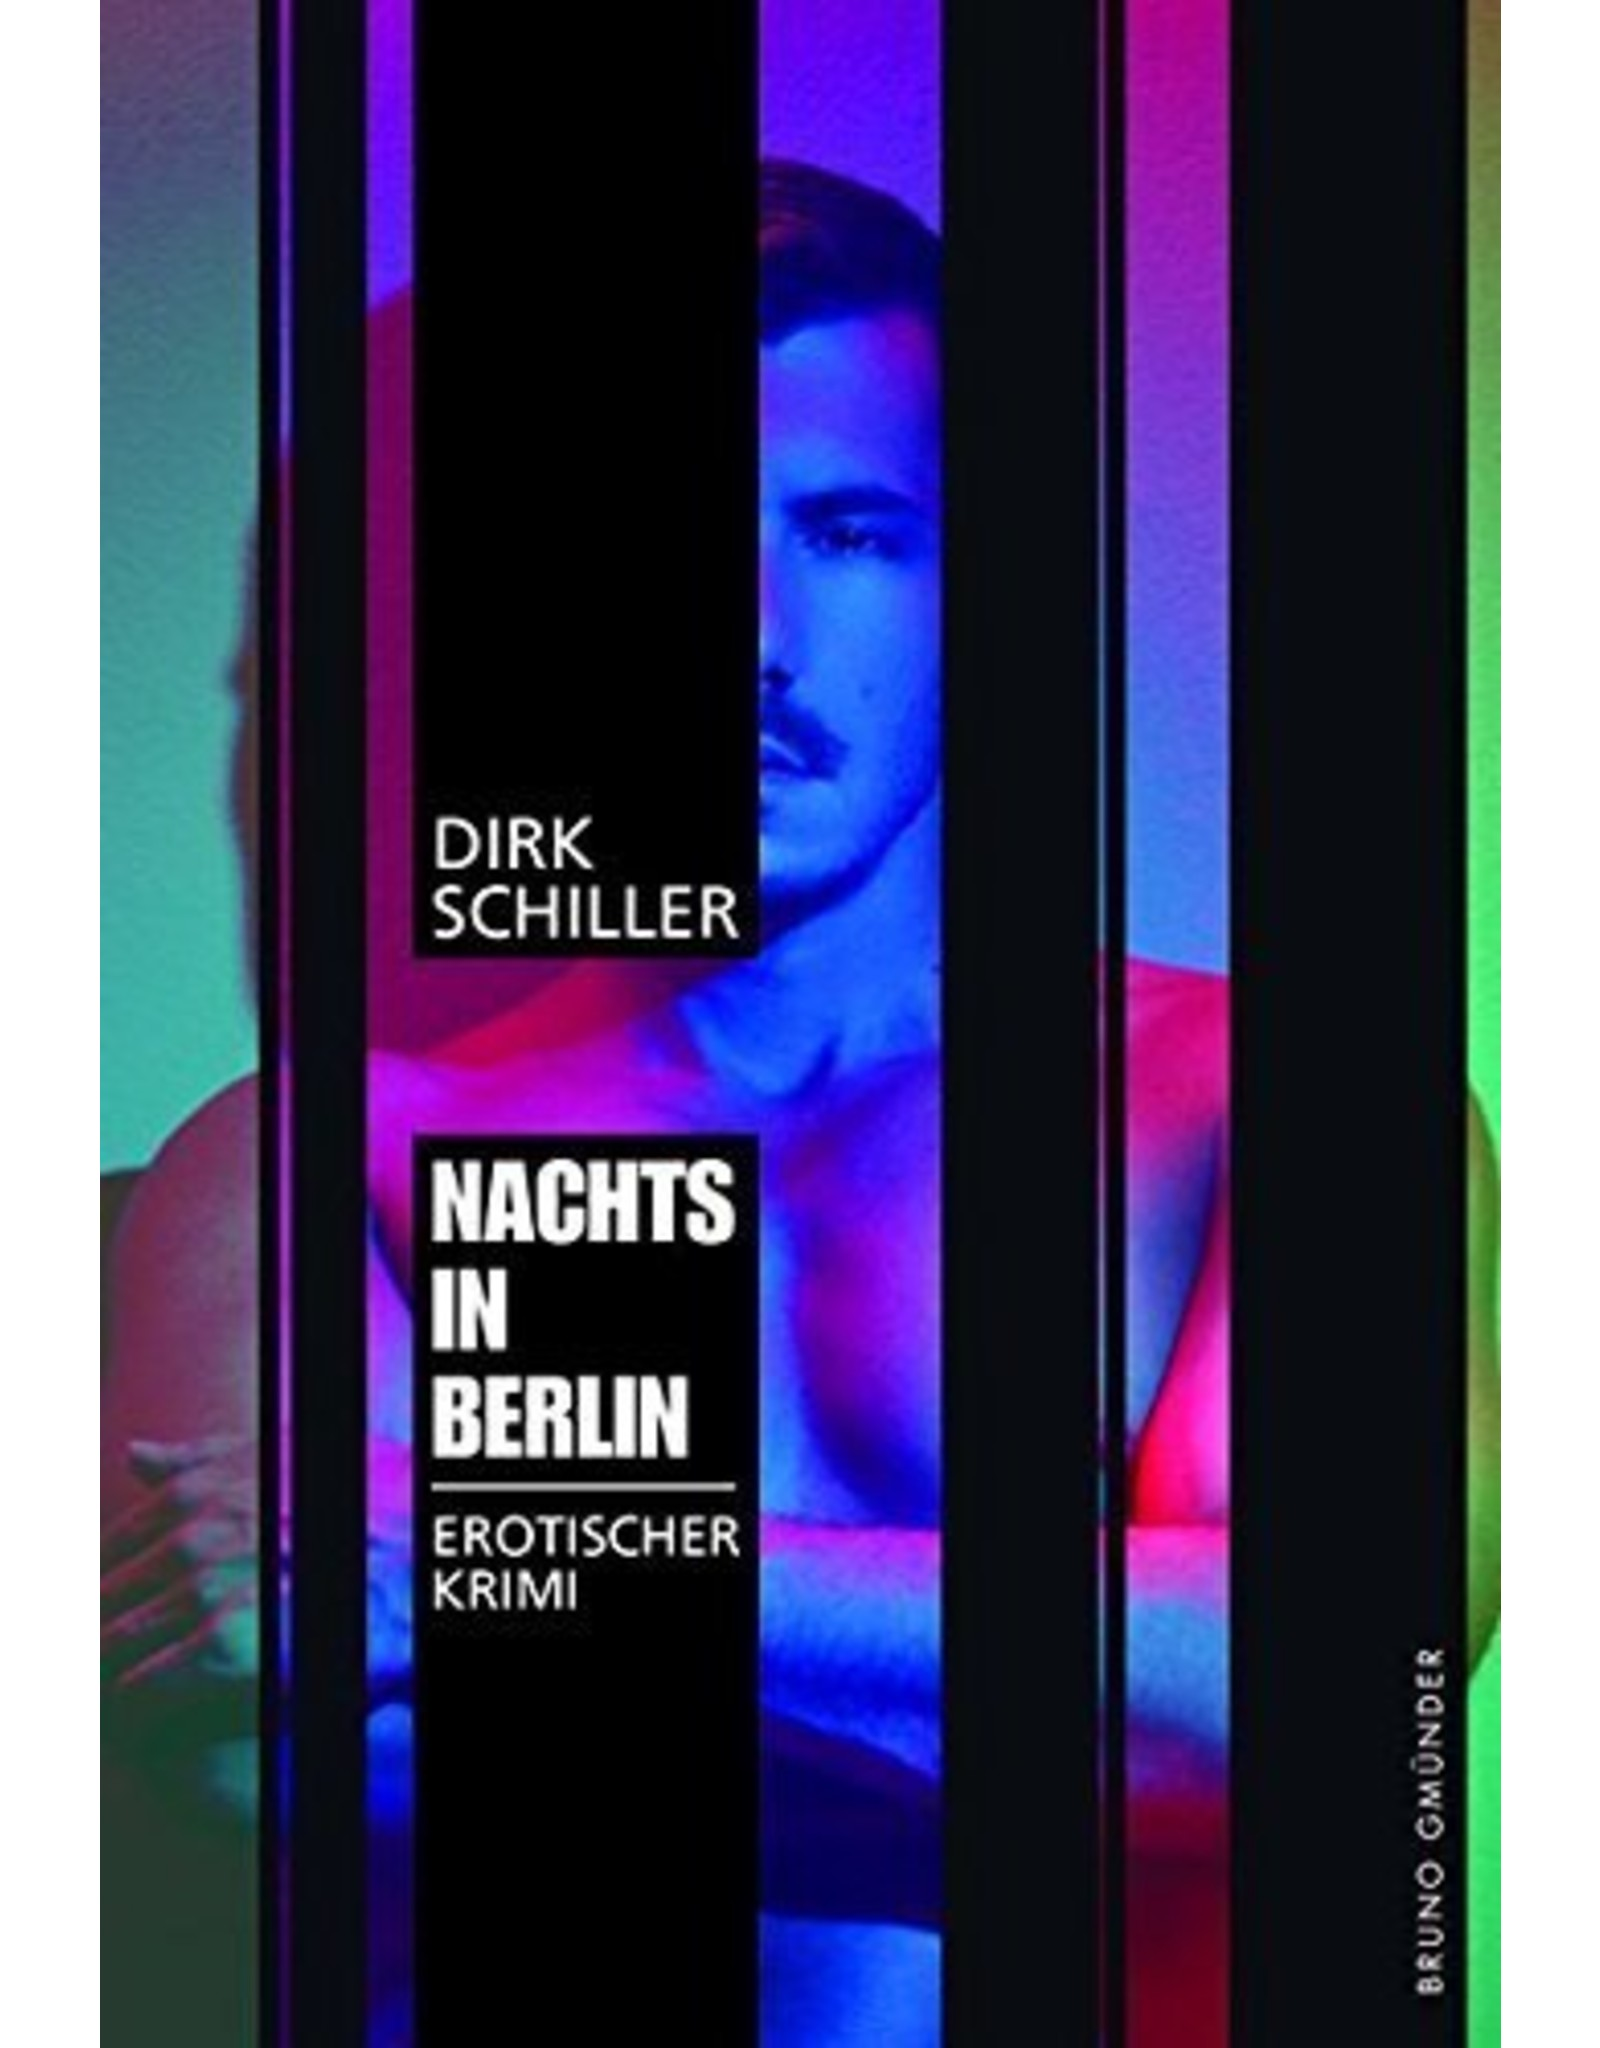 Nachts in Berlin